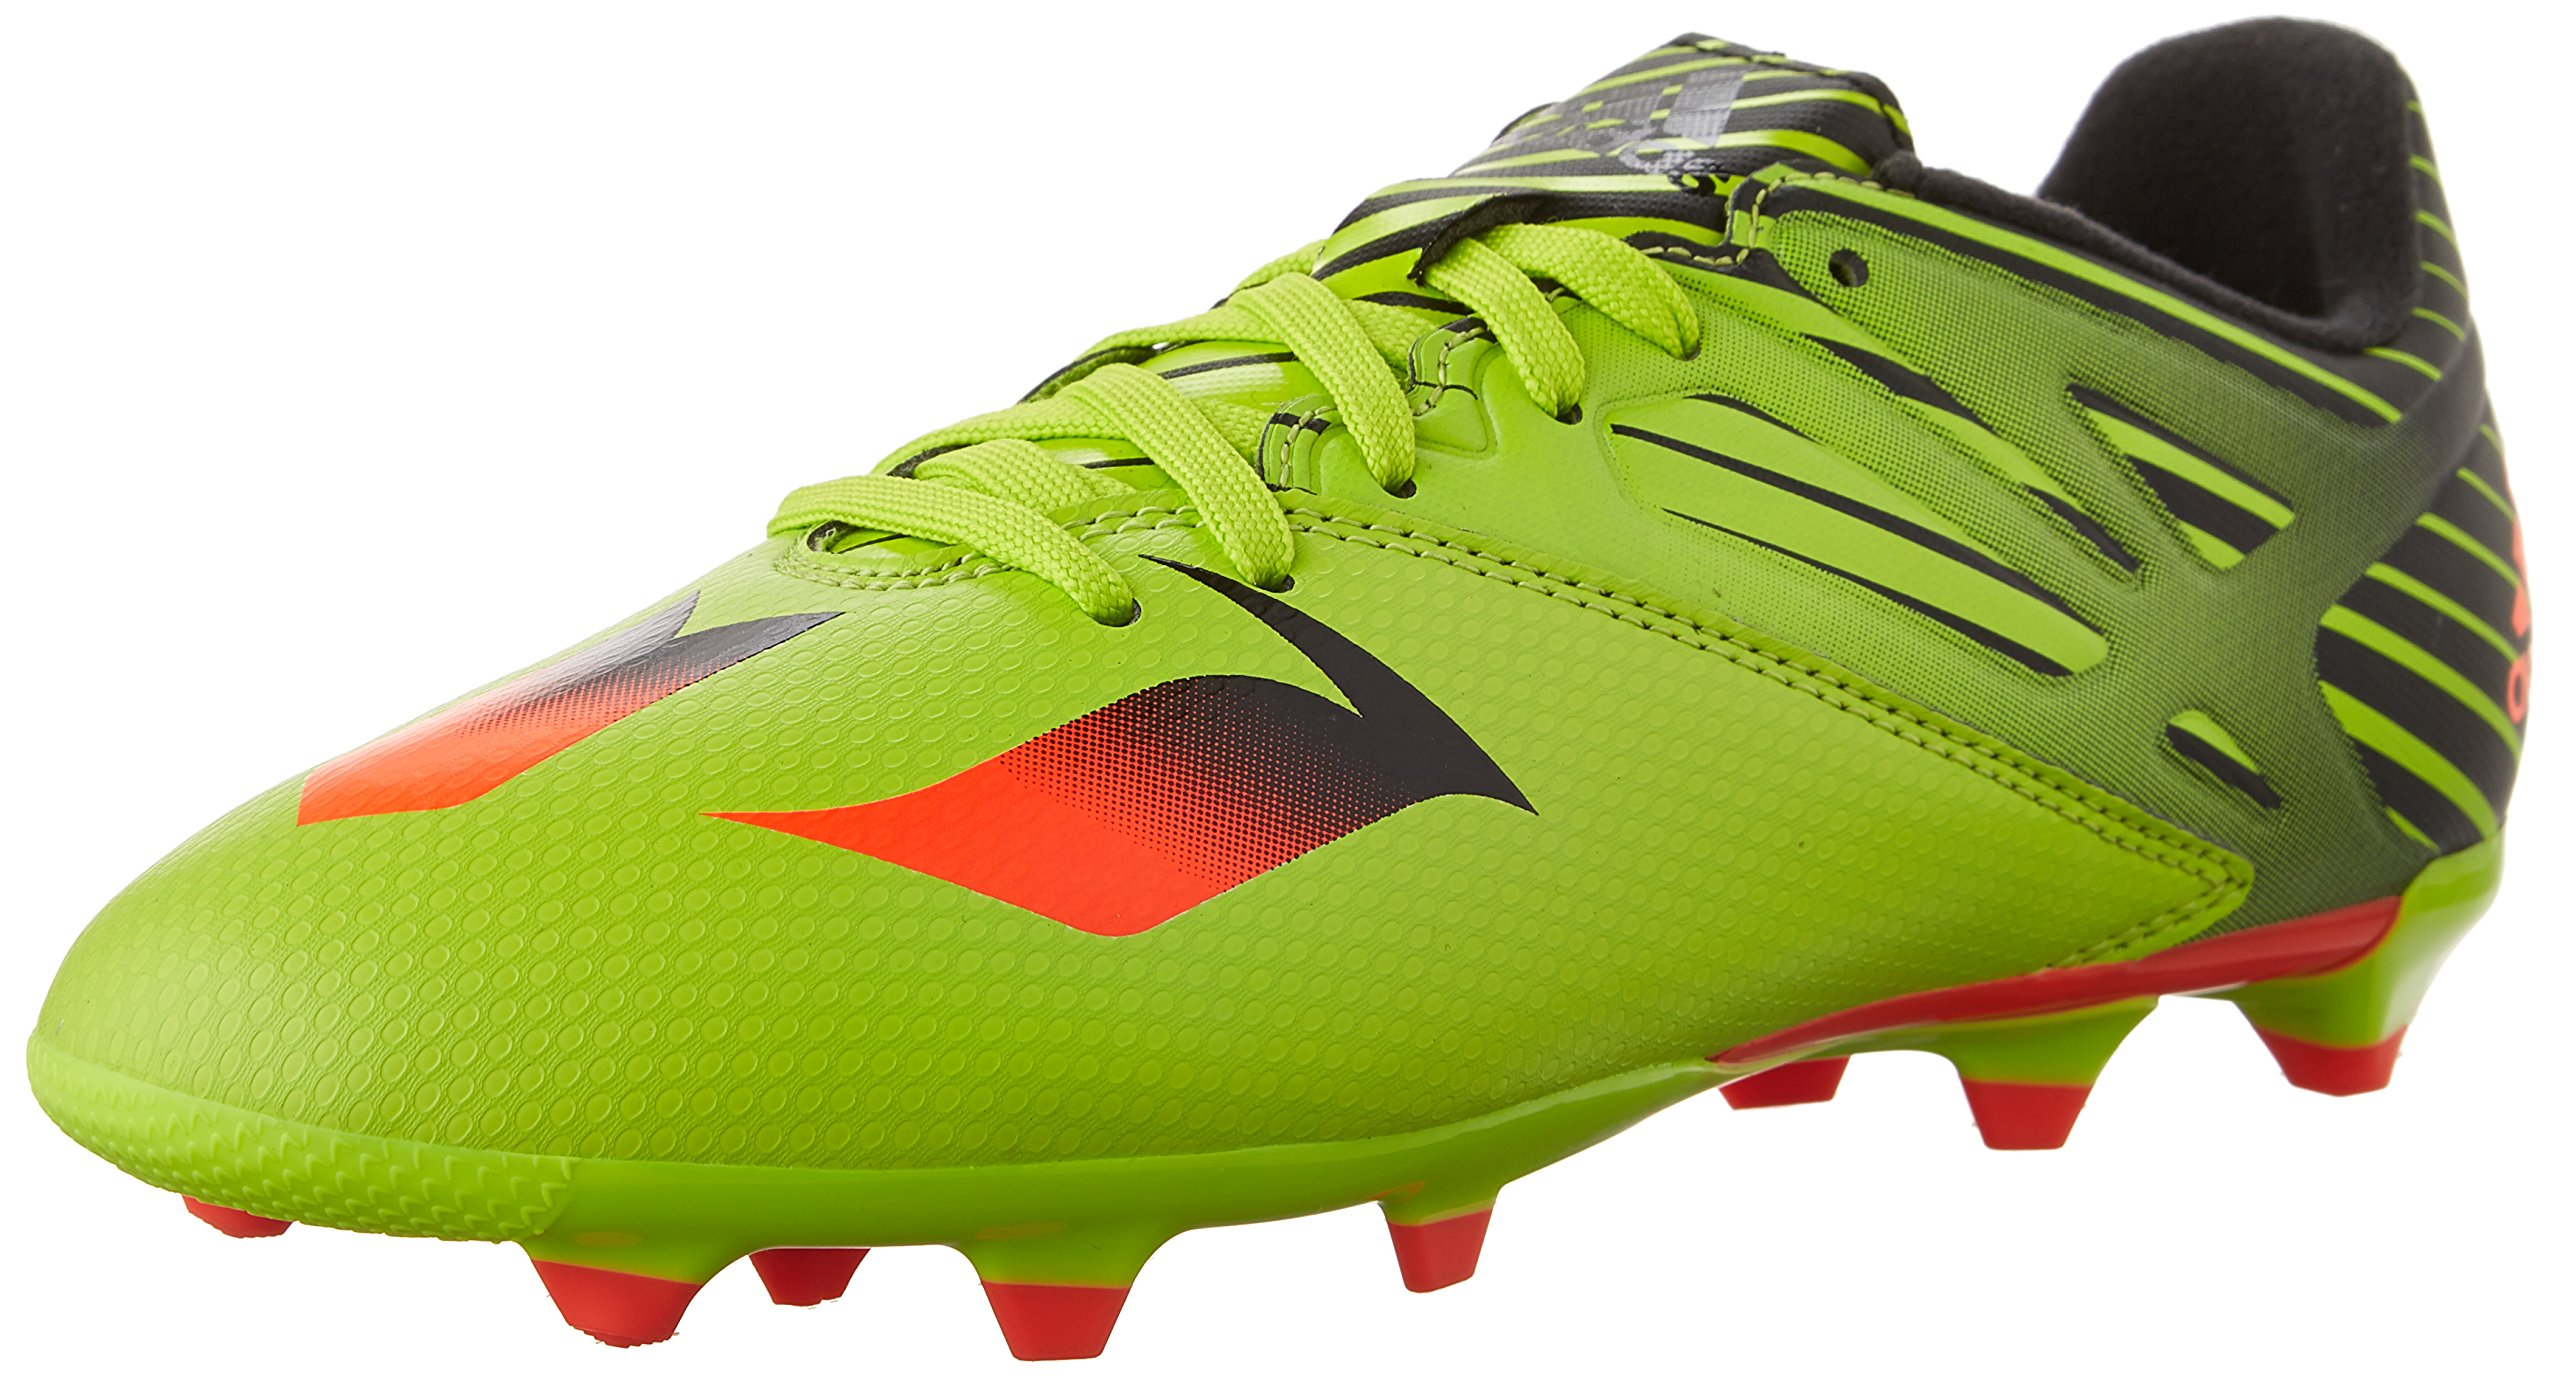 072d905cb92 adidas Performance Messi 15.3 J Soccer Shoe (Little Kid Big Kid) product  image